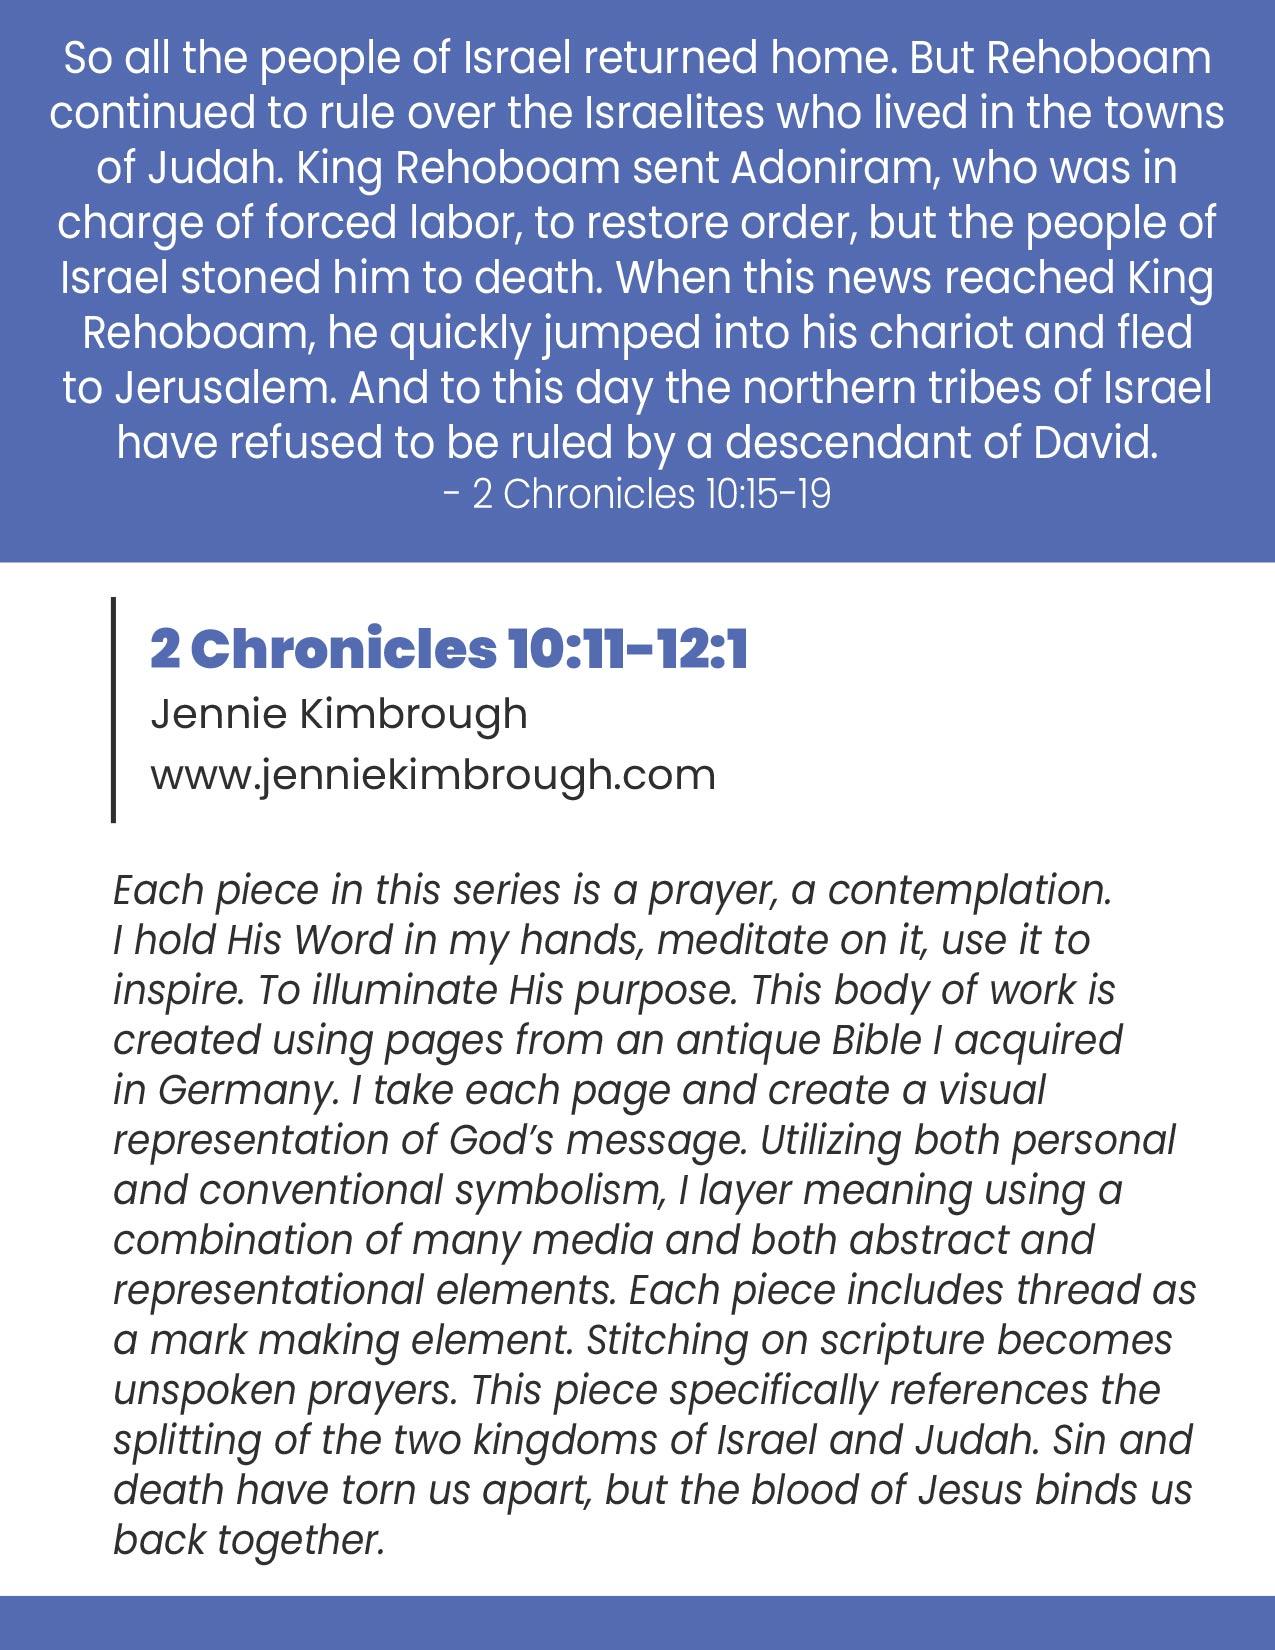 2 Chronicles 10:15-19